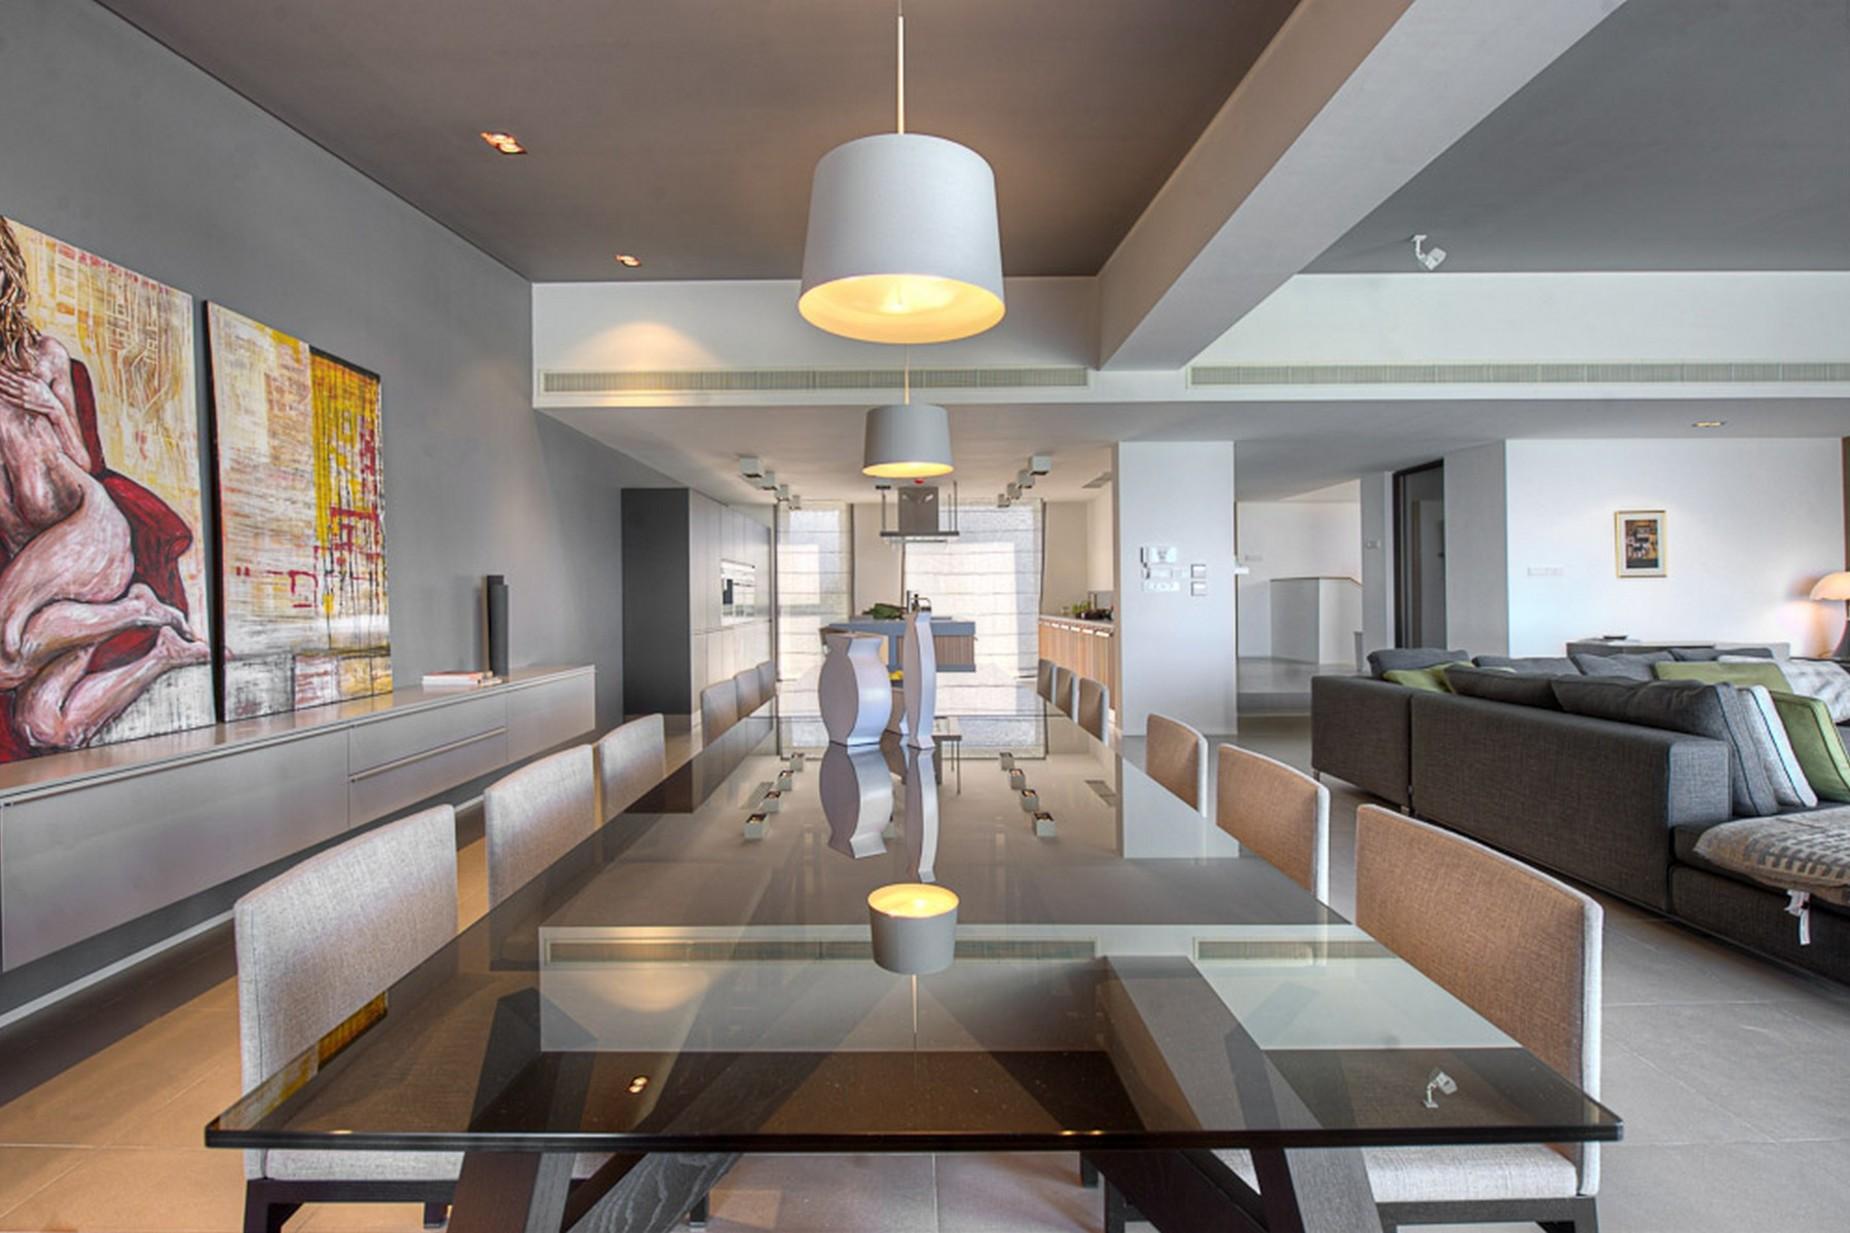 3 bed Villa For Sale in Bahar ic-Caghaq, Bahar ic-Caghaq - thumb 2